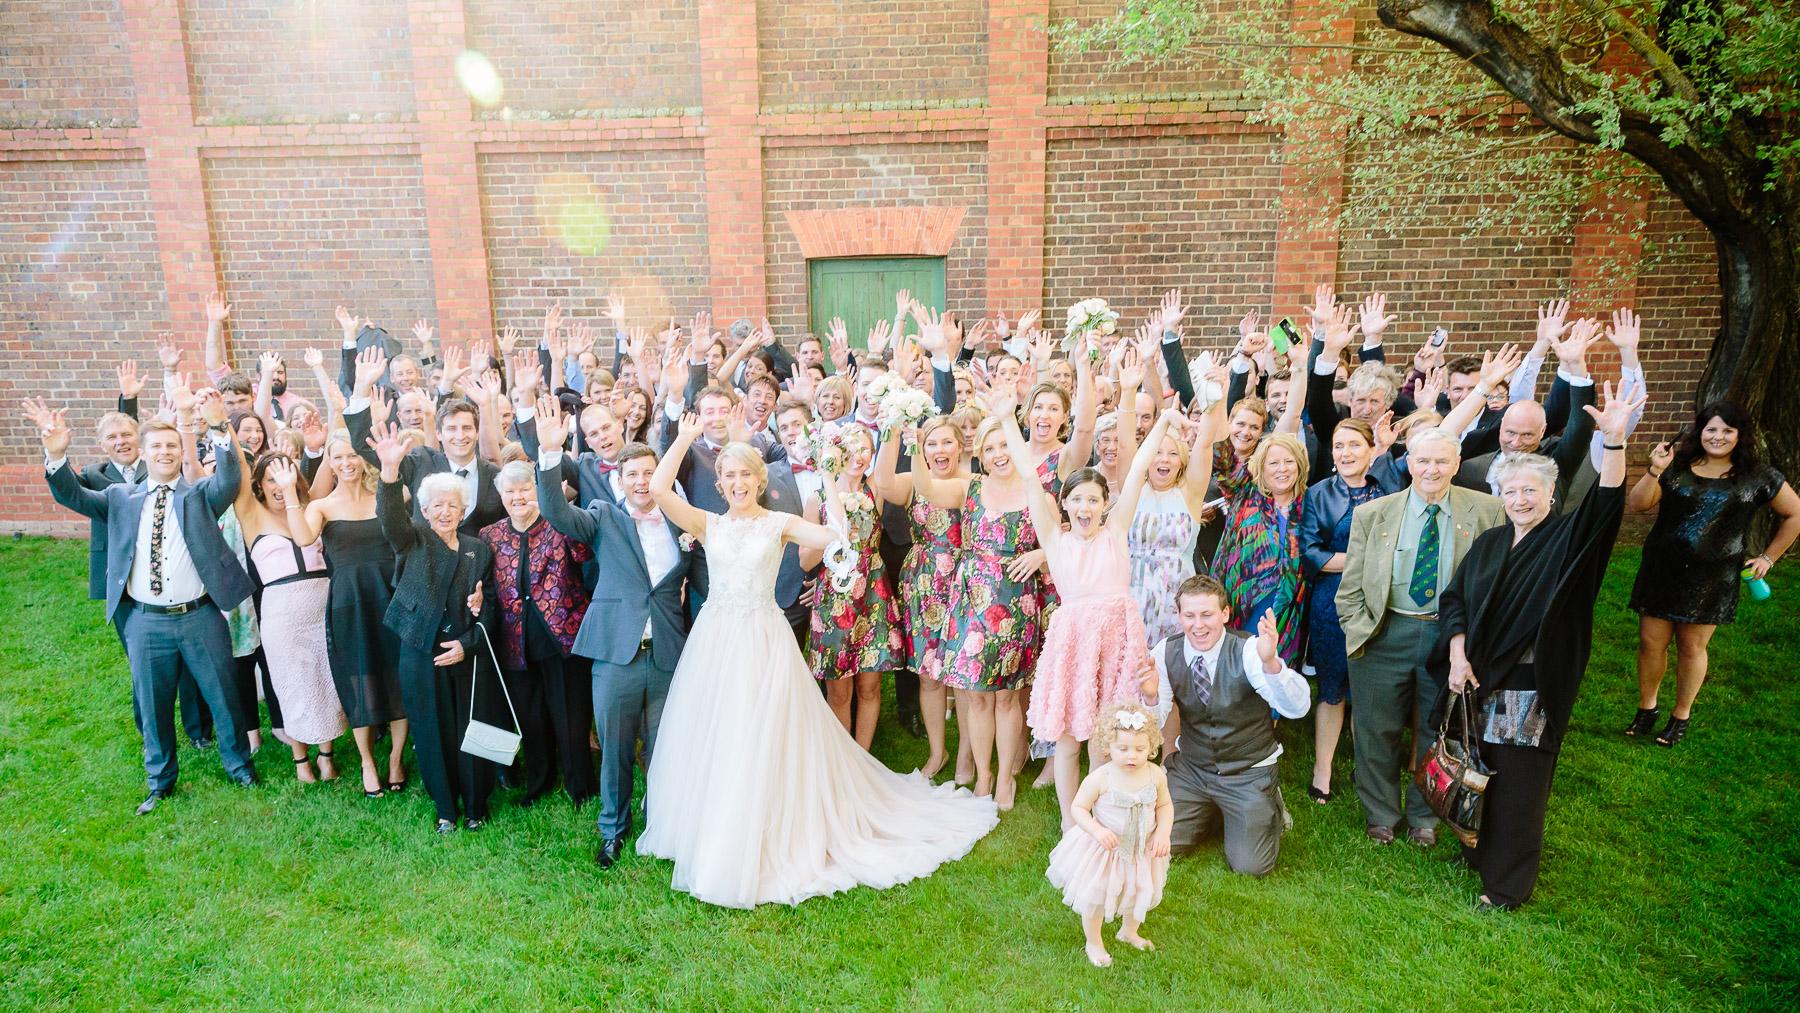 Marnie_and_Charlie_Yarra_Valley_Wedding_Blog-61.jpg